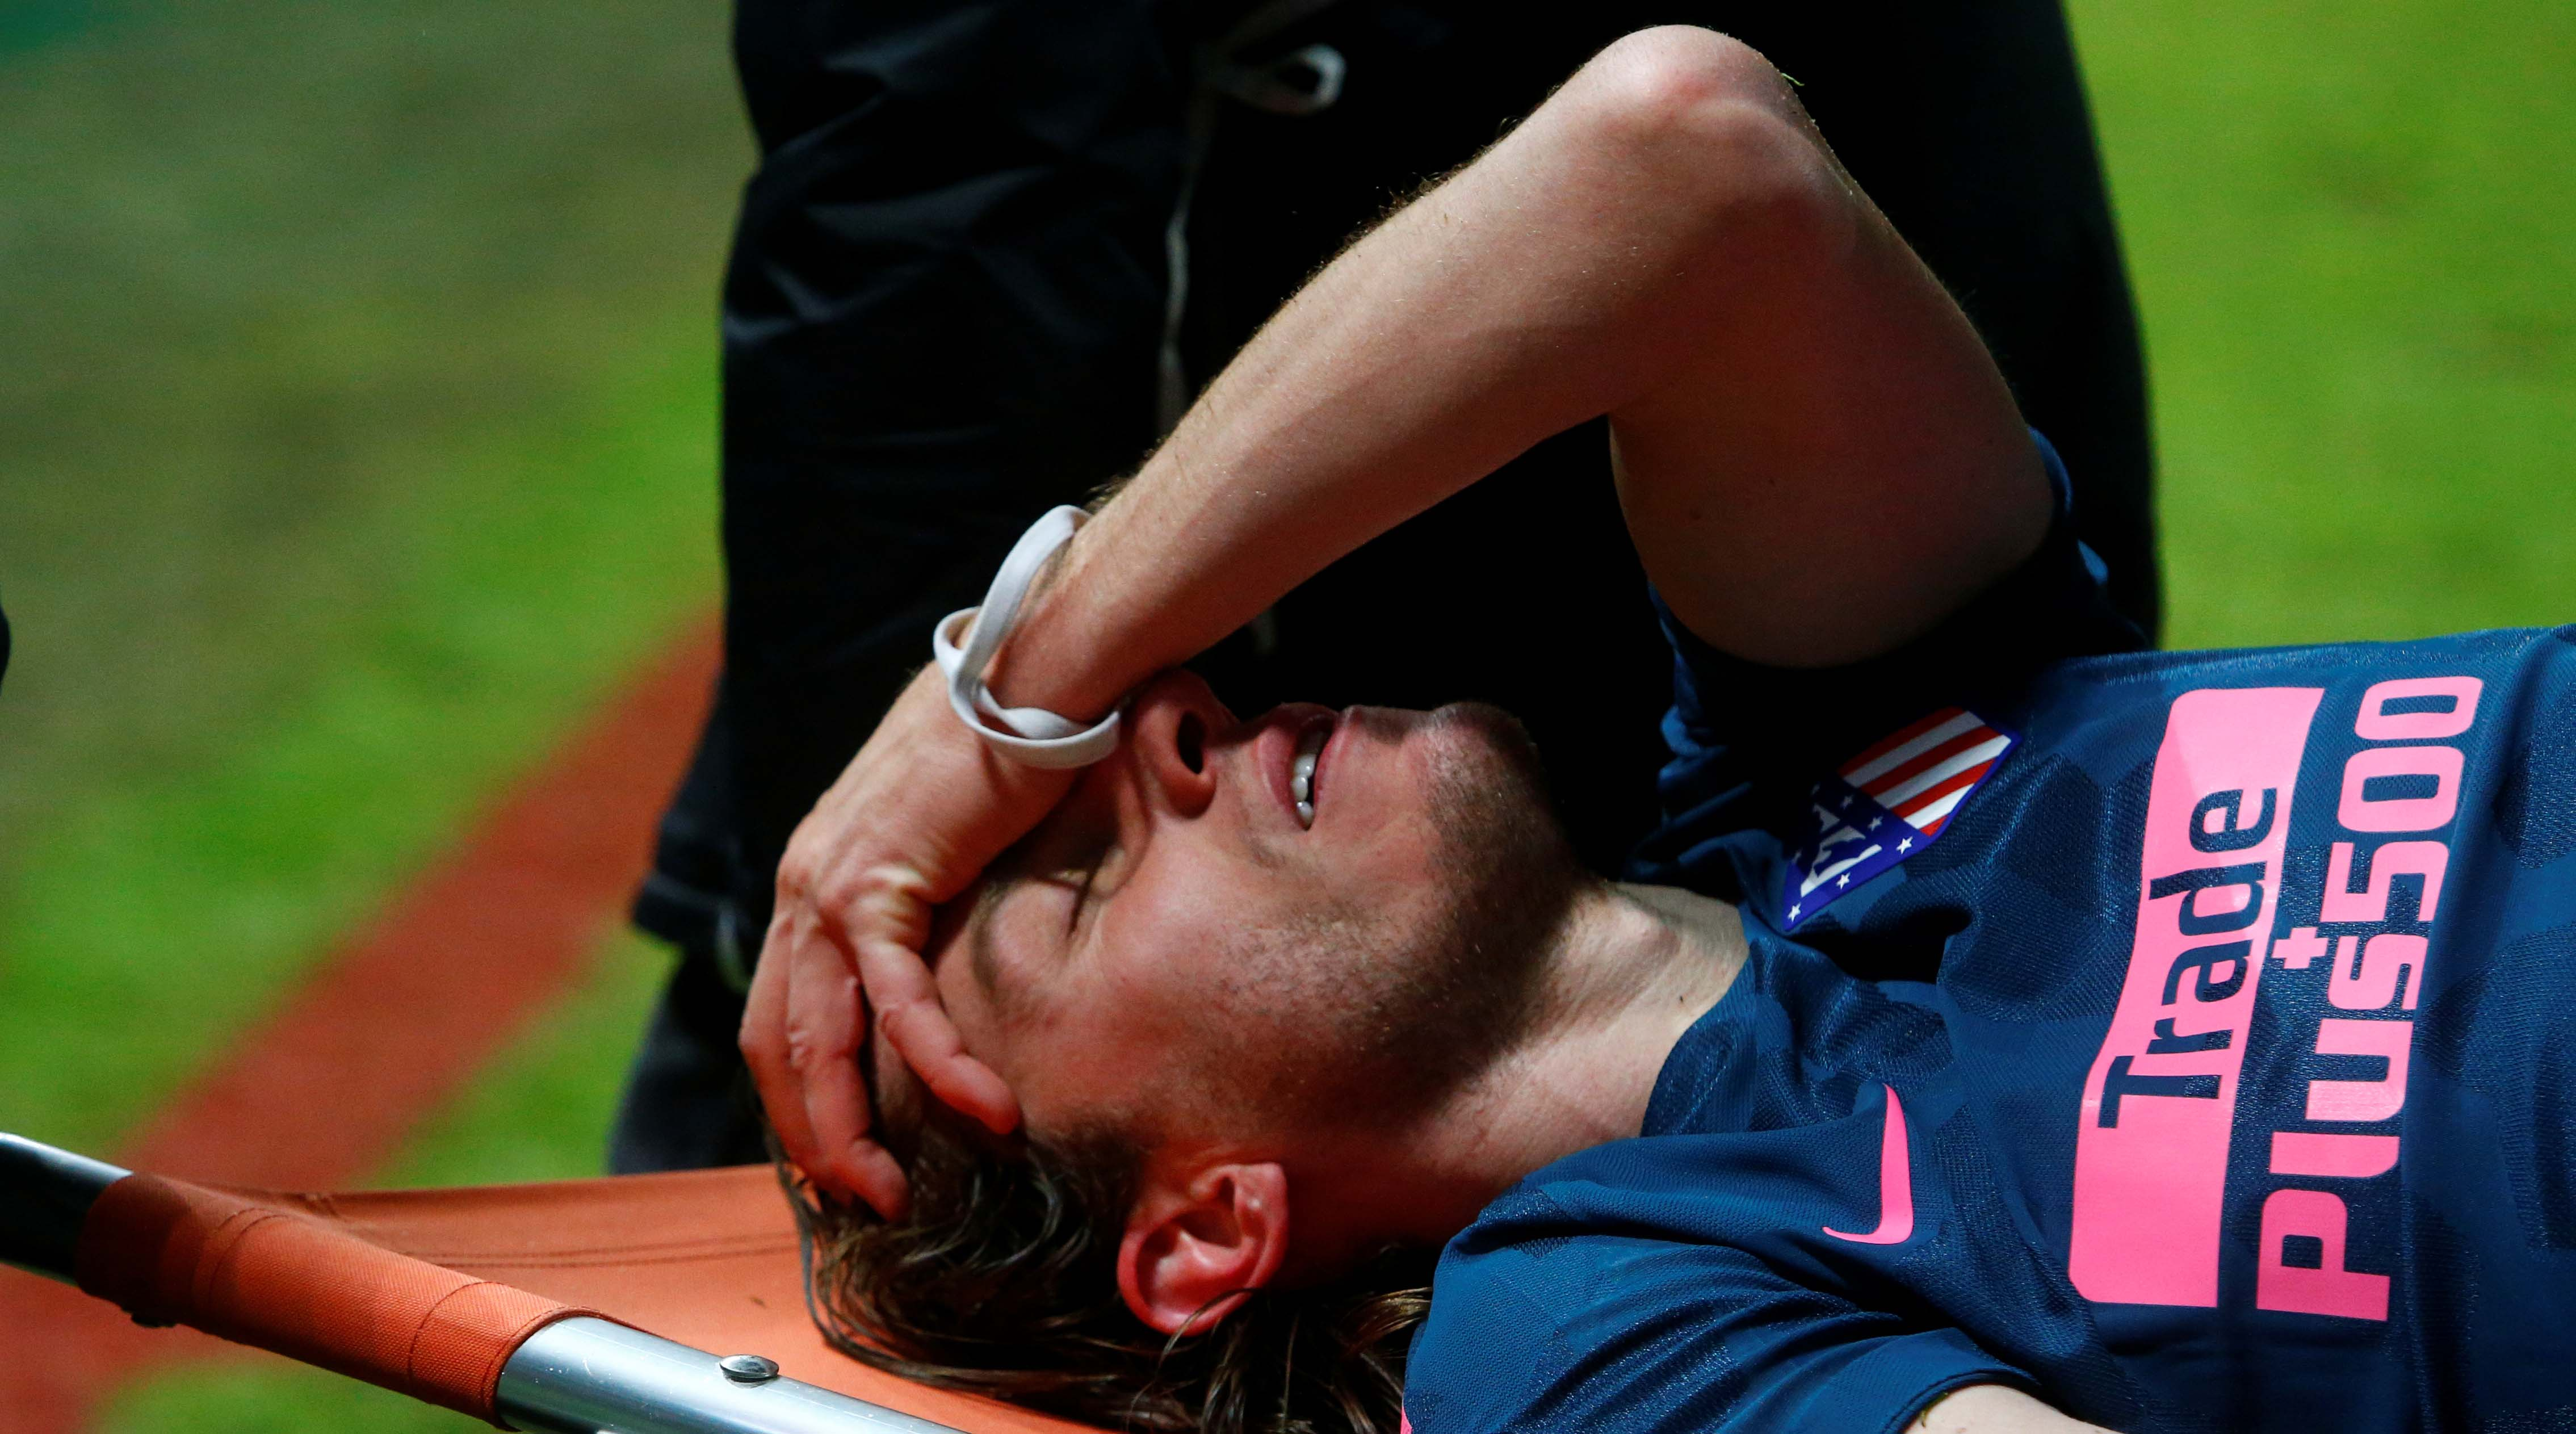 Atletico Madrid and Brazil defender Filipe Luis breaks leg, set to miss World Cup